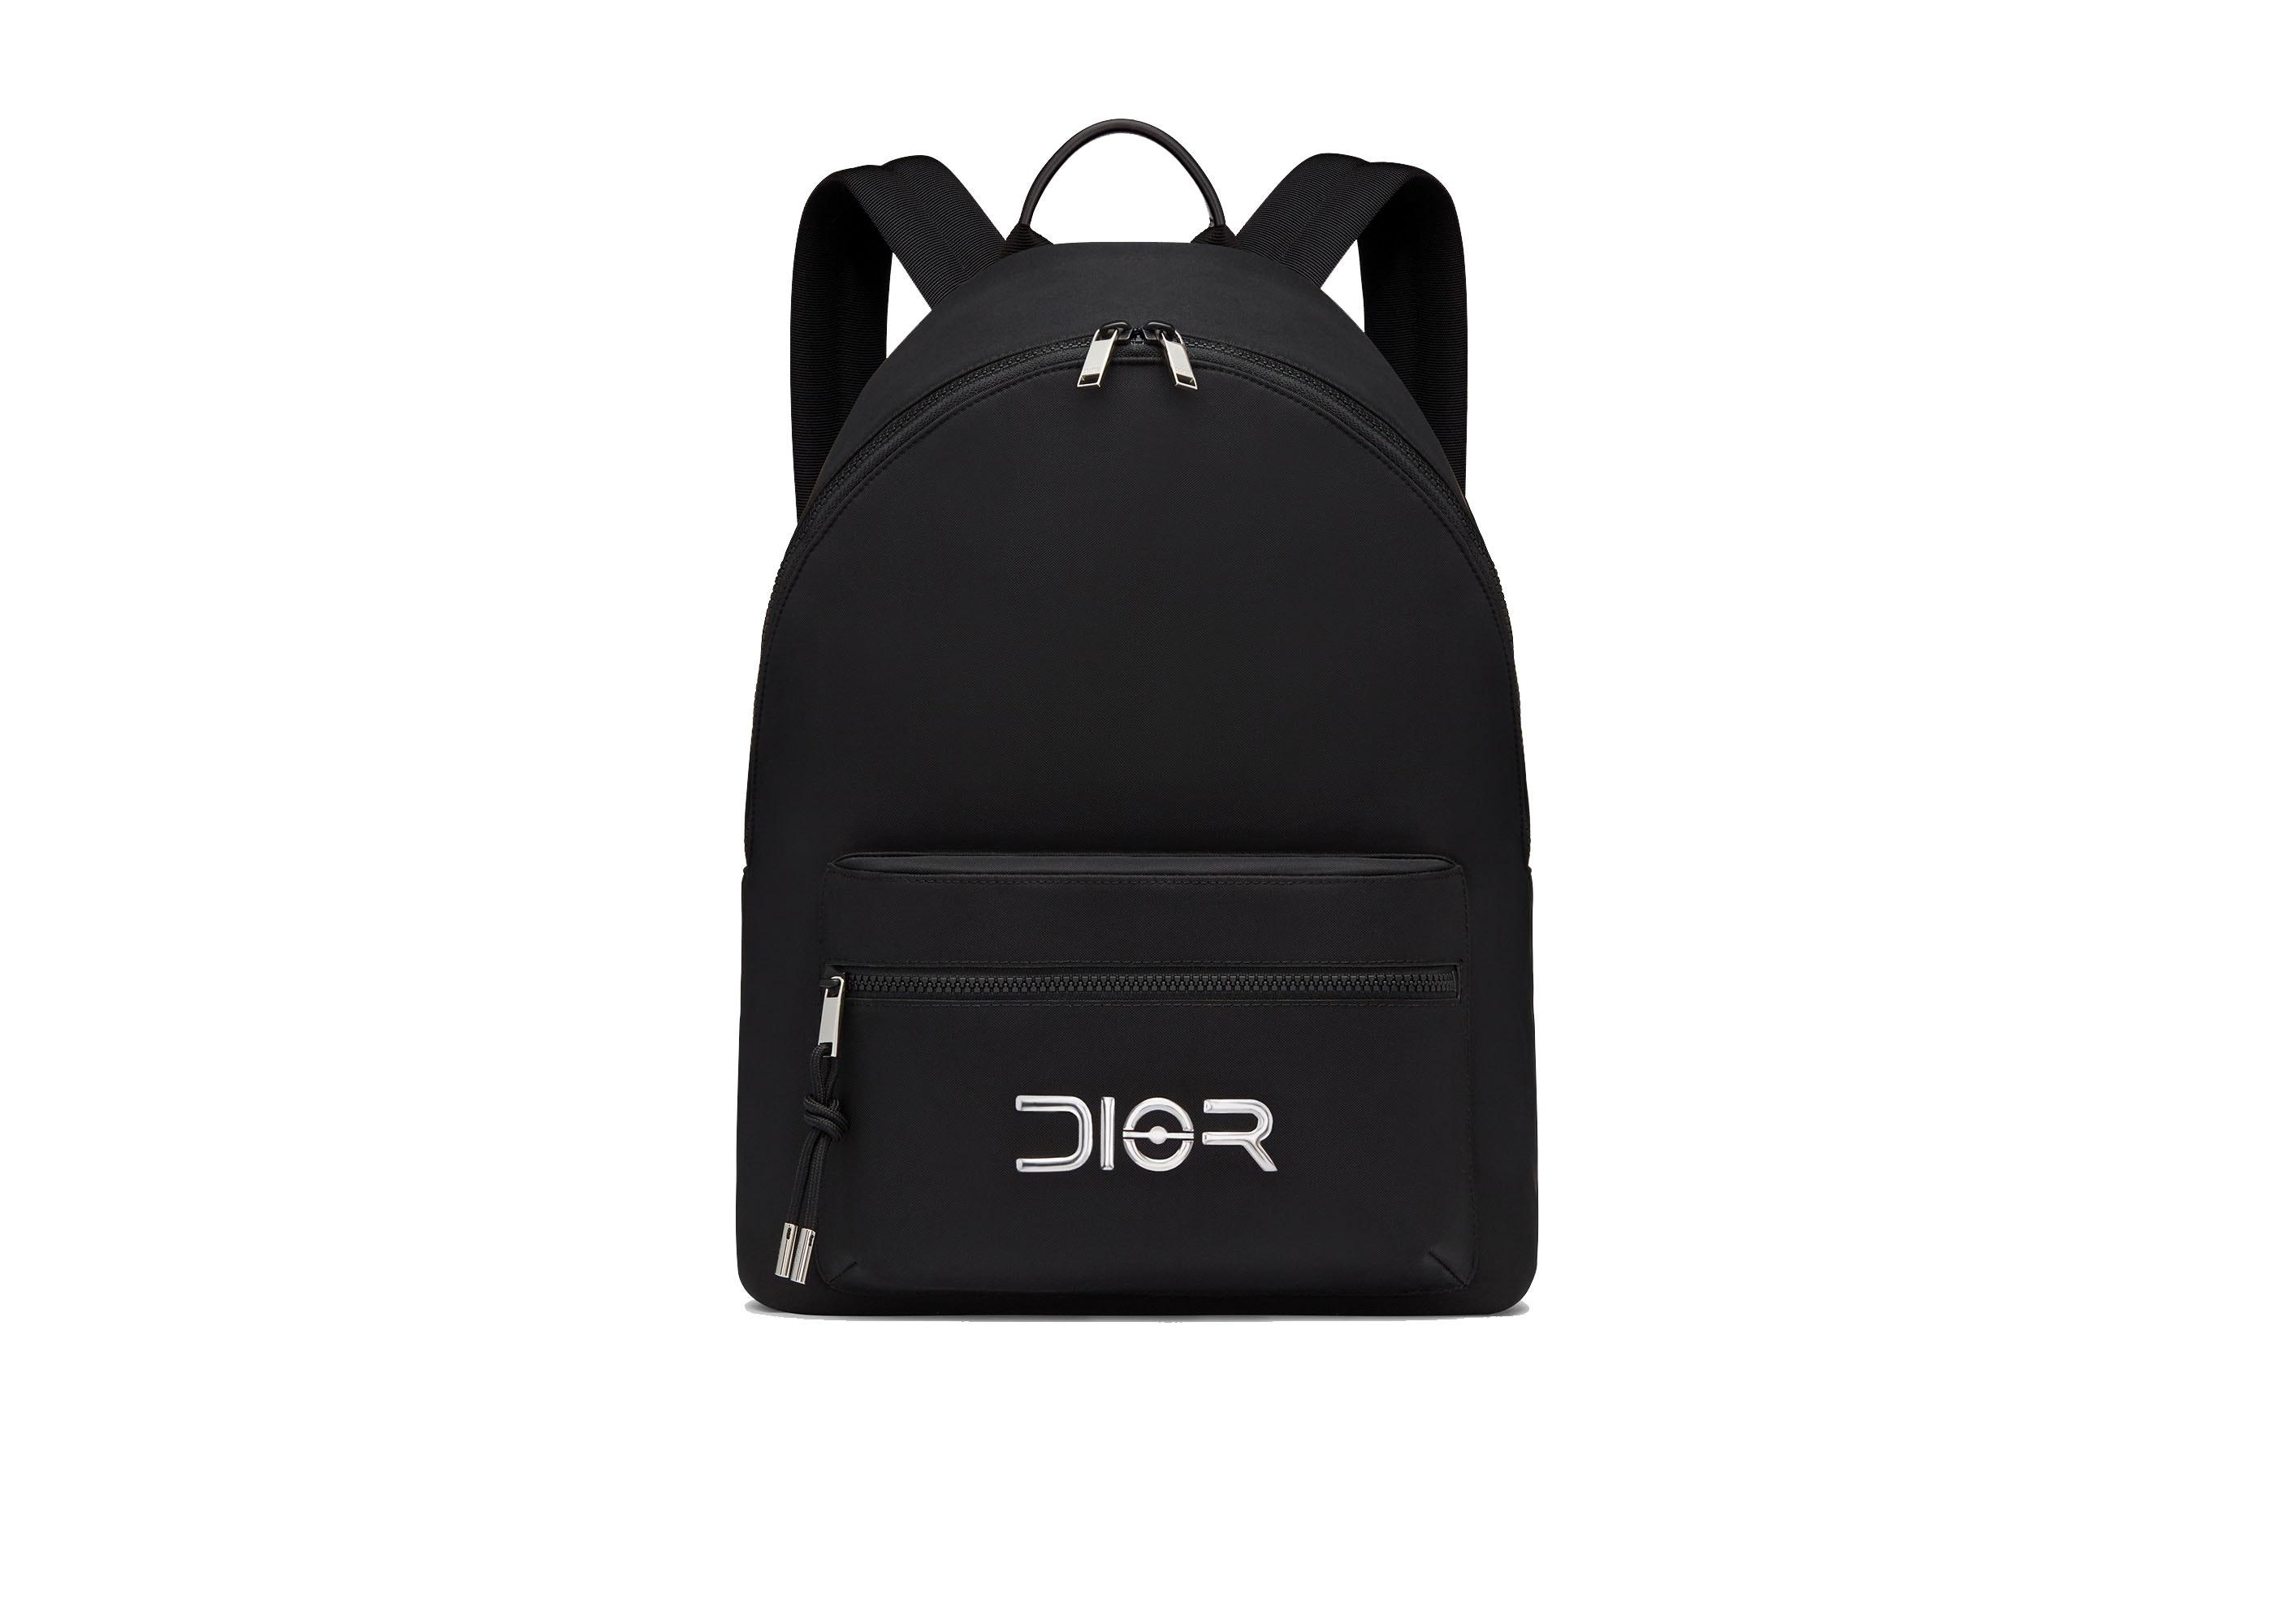 Dior x Sorayama Backpack Nylon Black